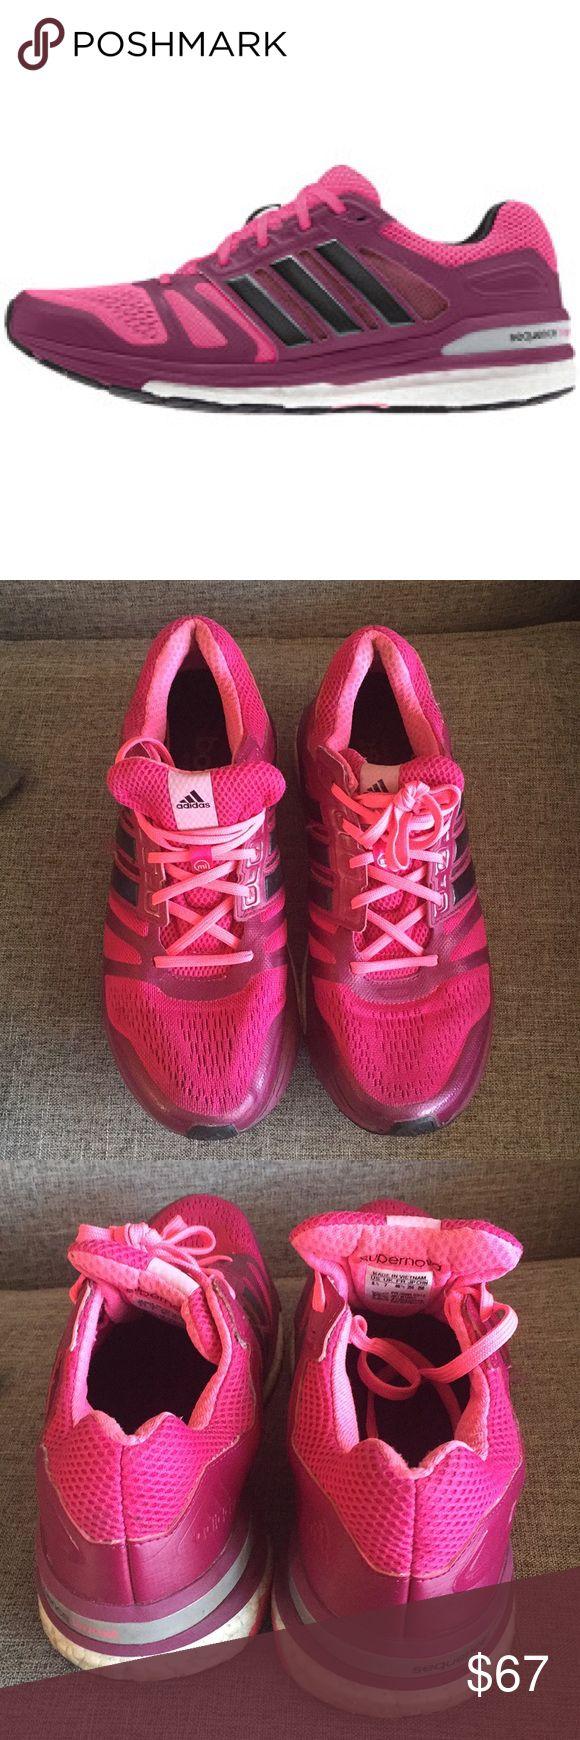 Adidas Supernova sequence shoes Adidas Supernova, size 81/2, Eu 40 2/3, pink & burgundy , very good condition adidas Shoes Athletic Shoes